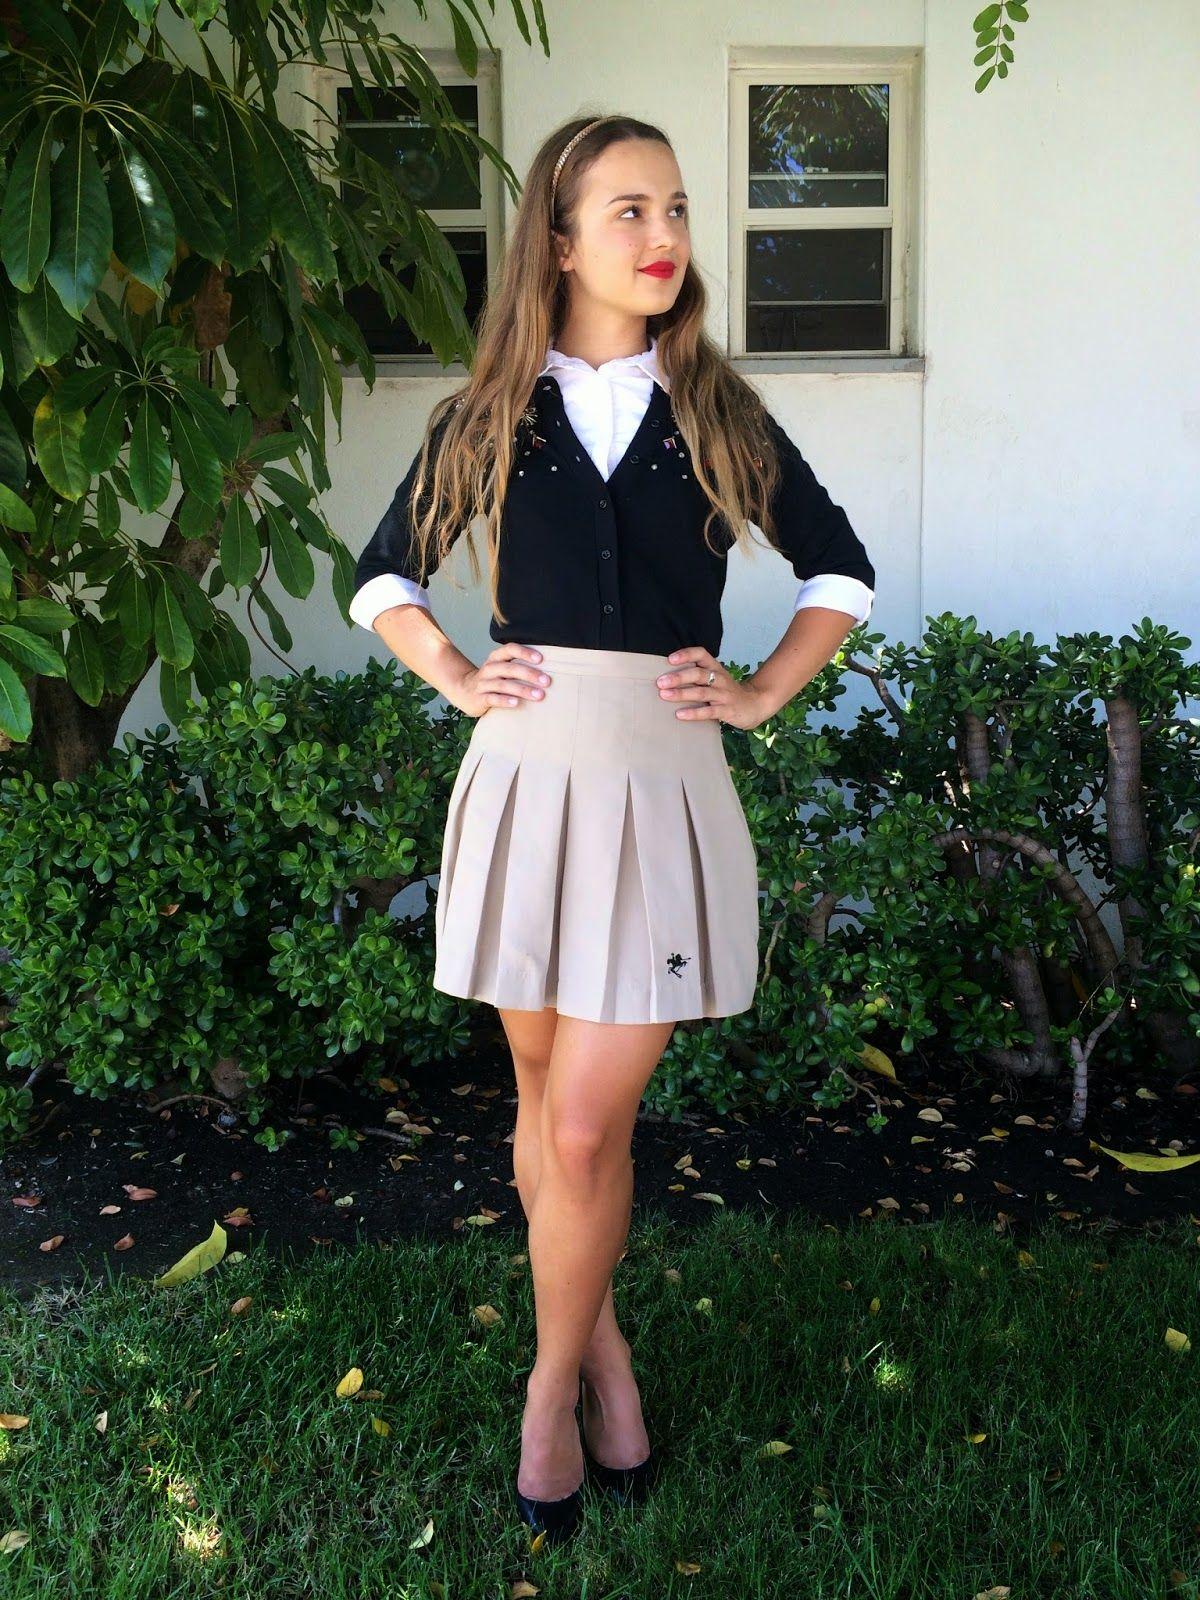 Uniform Styling Tips Looks Fashion Ivabellini Localfashion Pinterest School